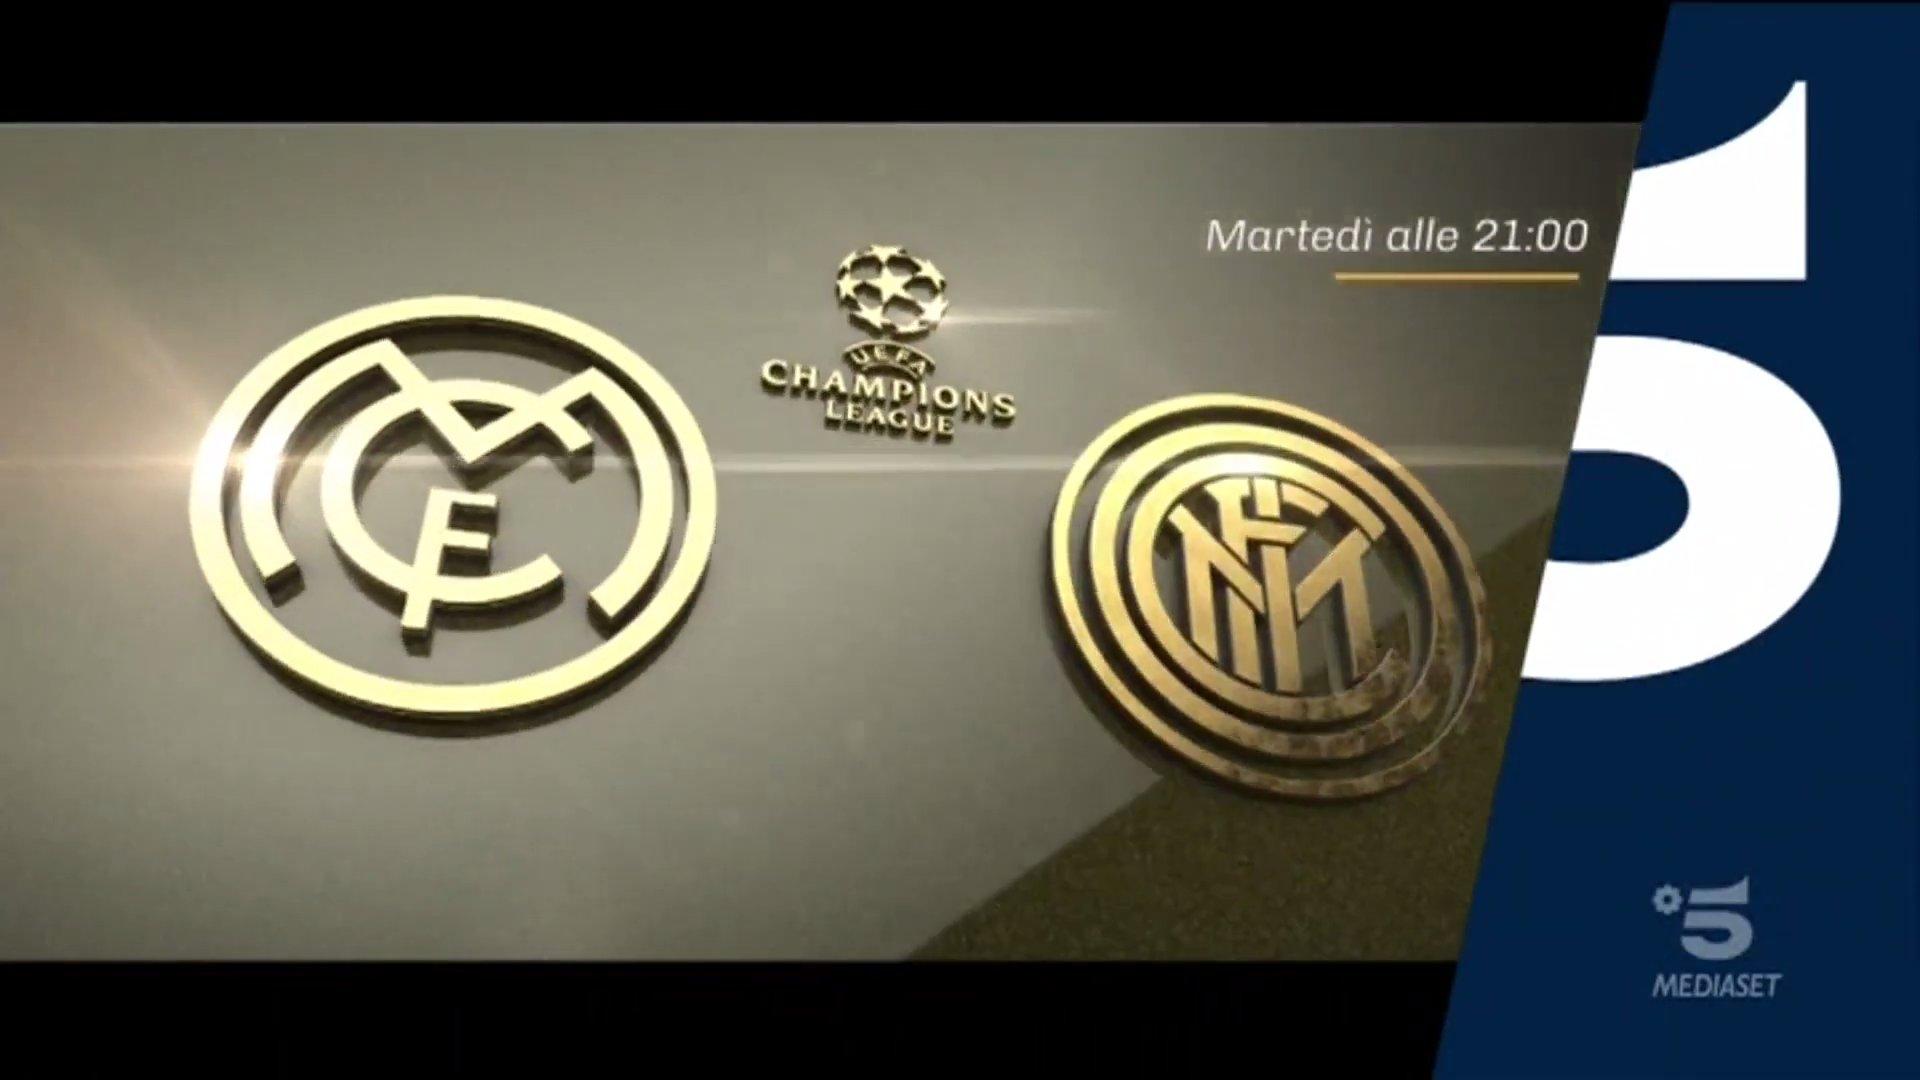 Champions, Real Madrid - Inter Diretta Canale 5, Telecronisti Sport Mediaset